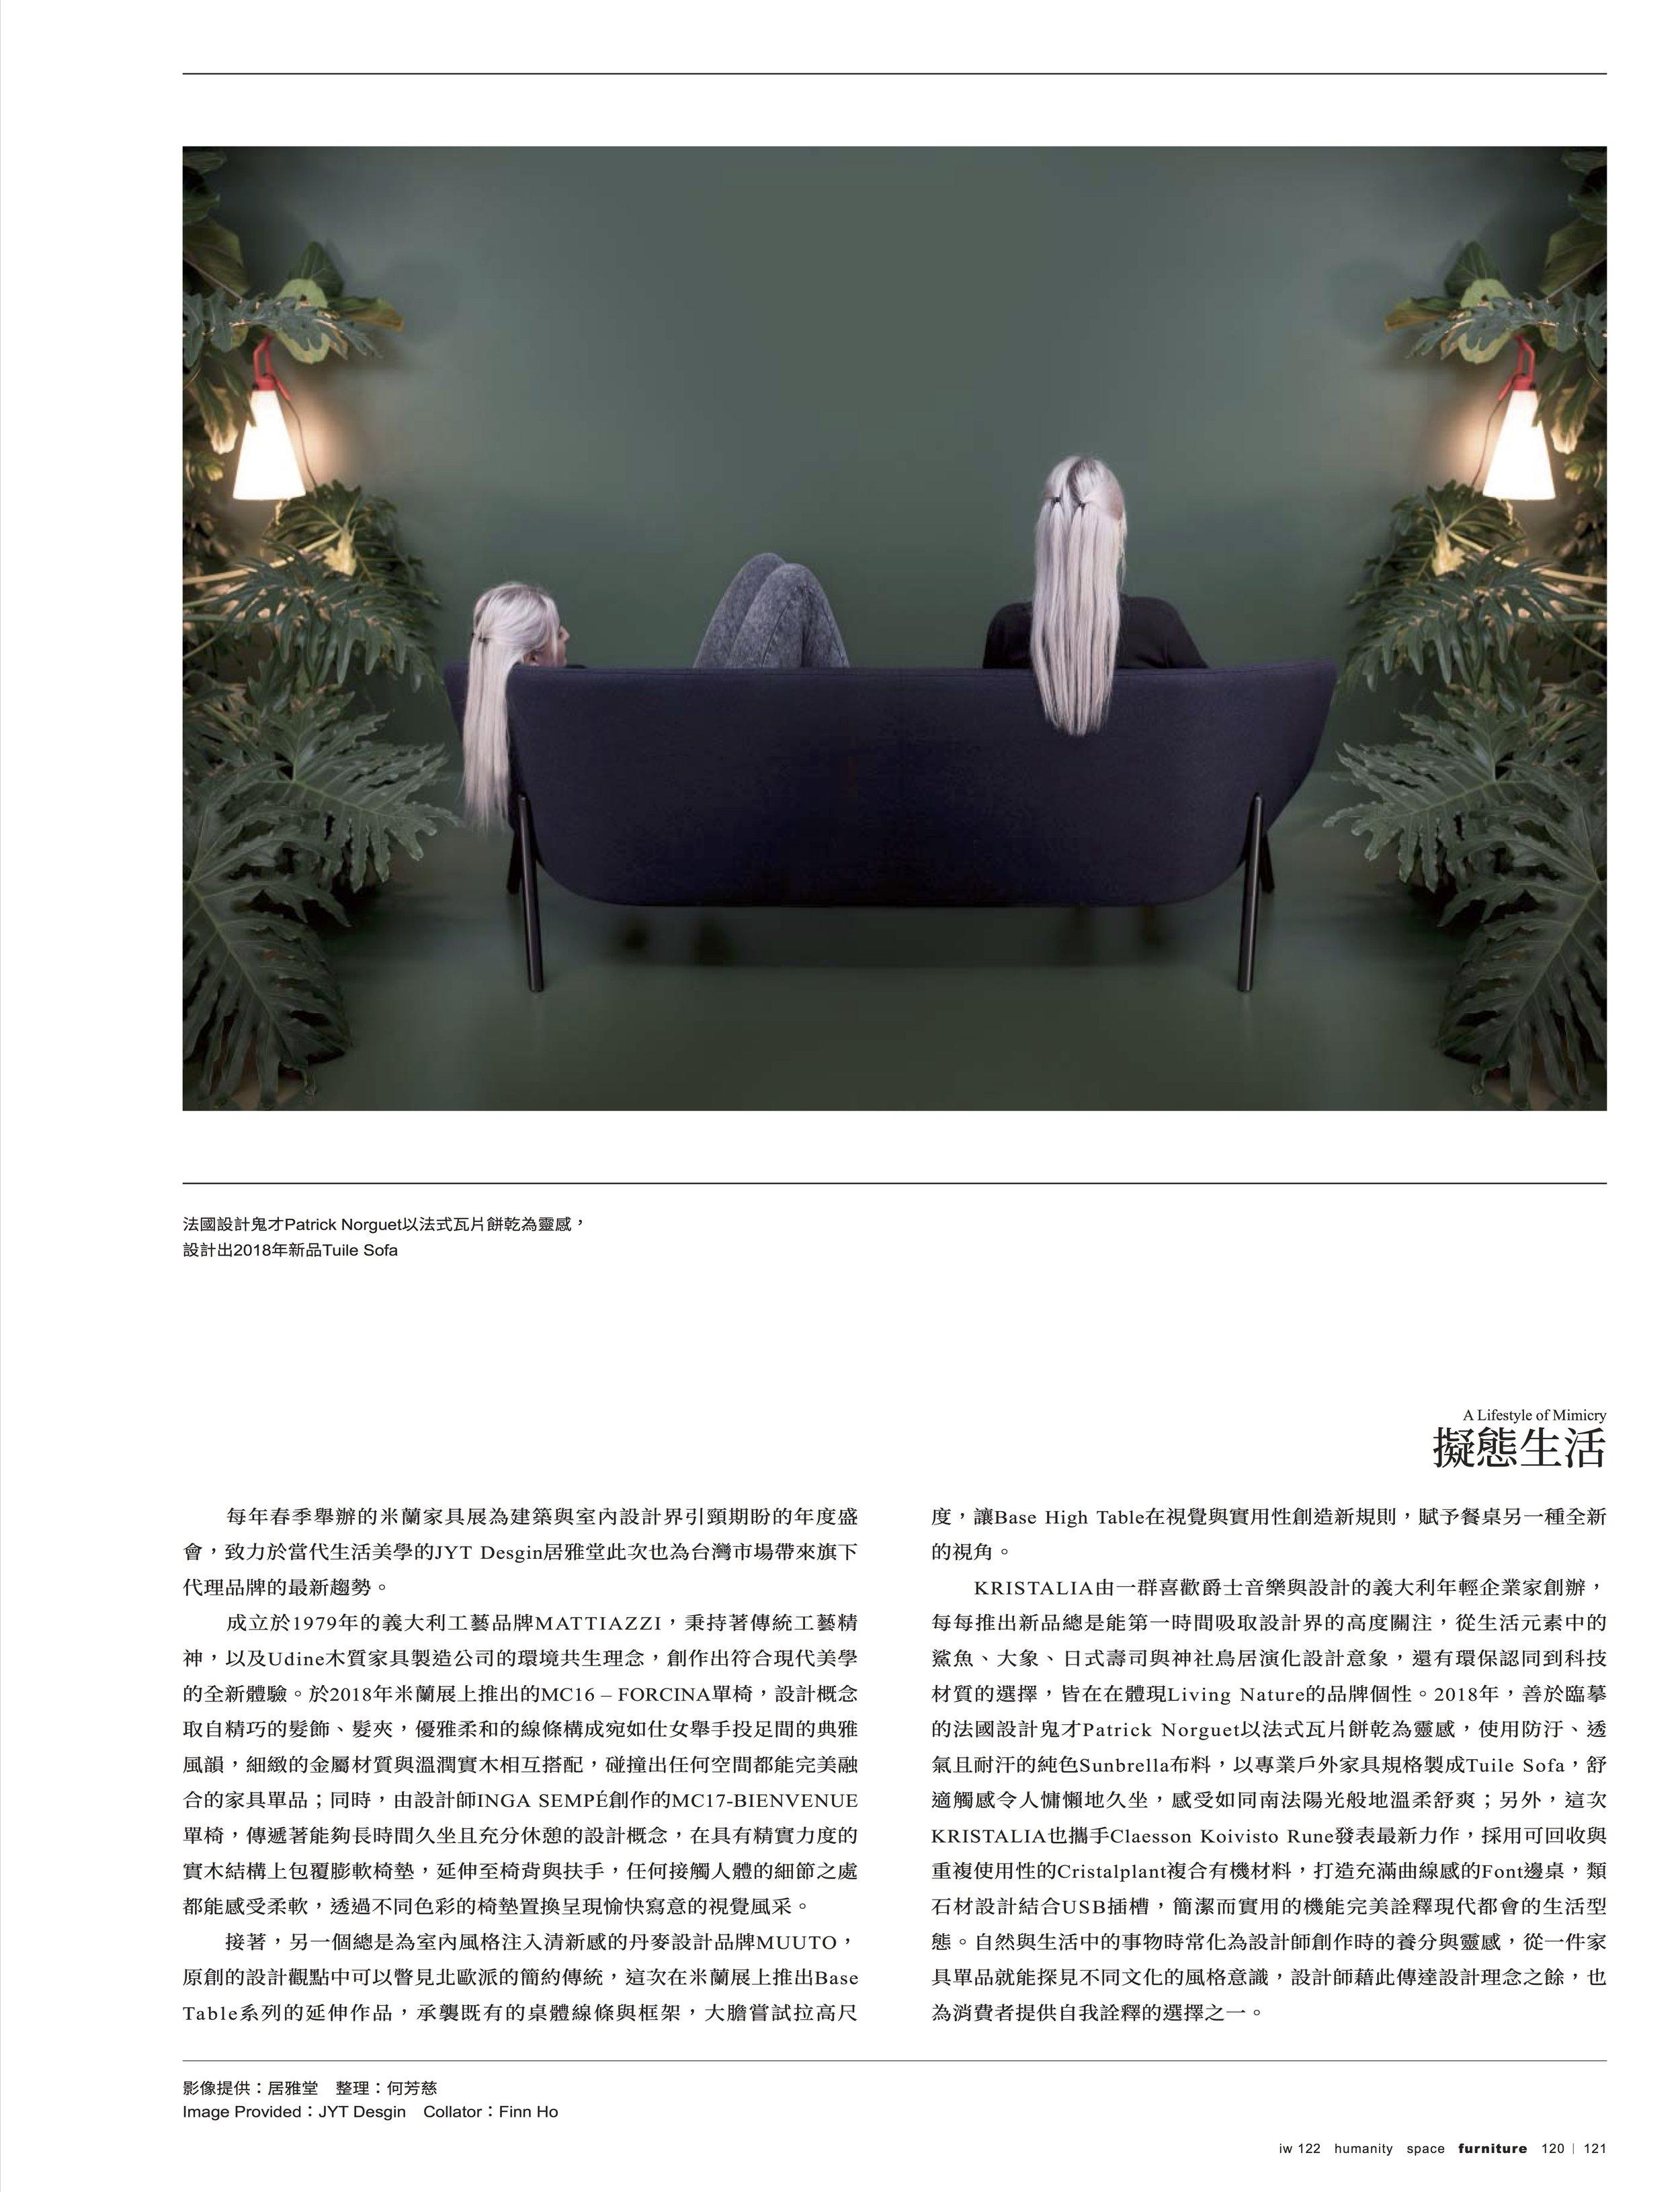 NO.122 IW品牌經營-居雅堂.jpg